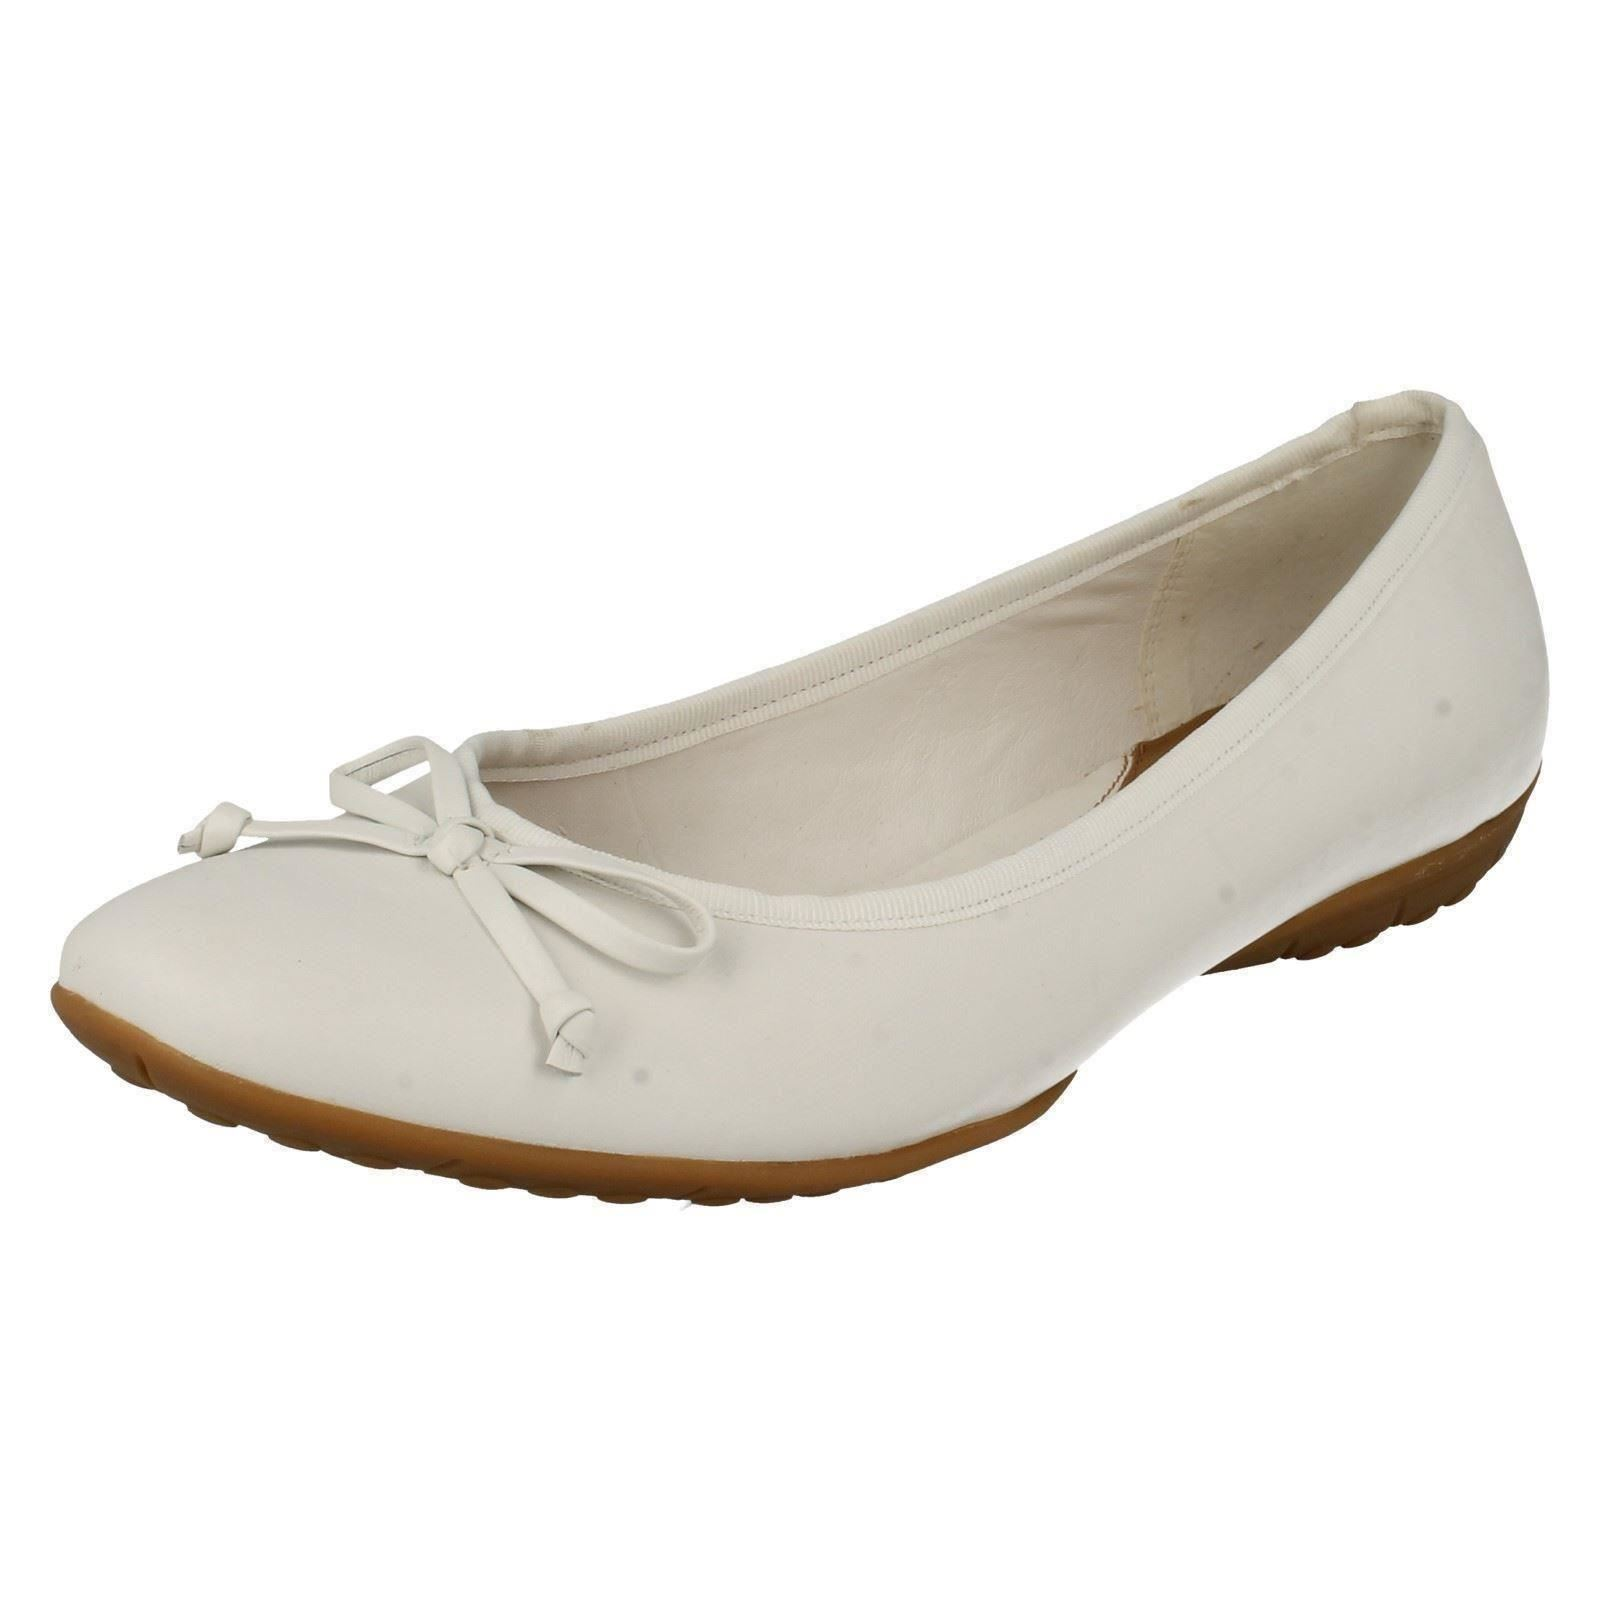 Arizona Heat Clarks Shoes